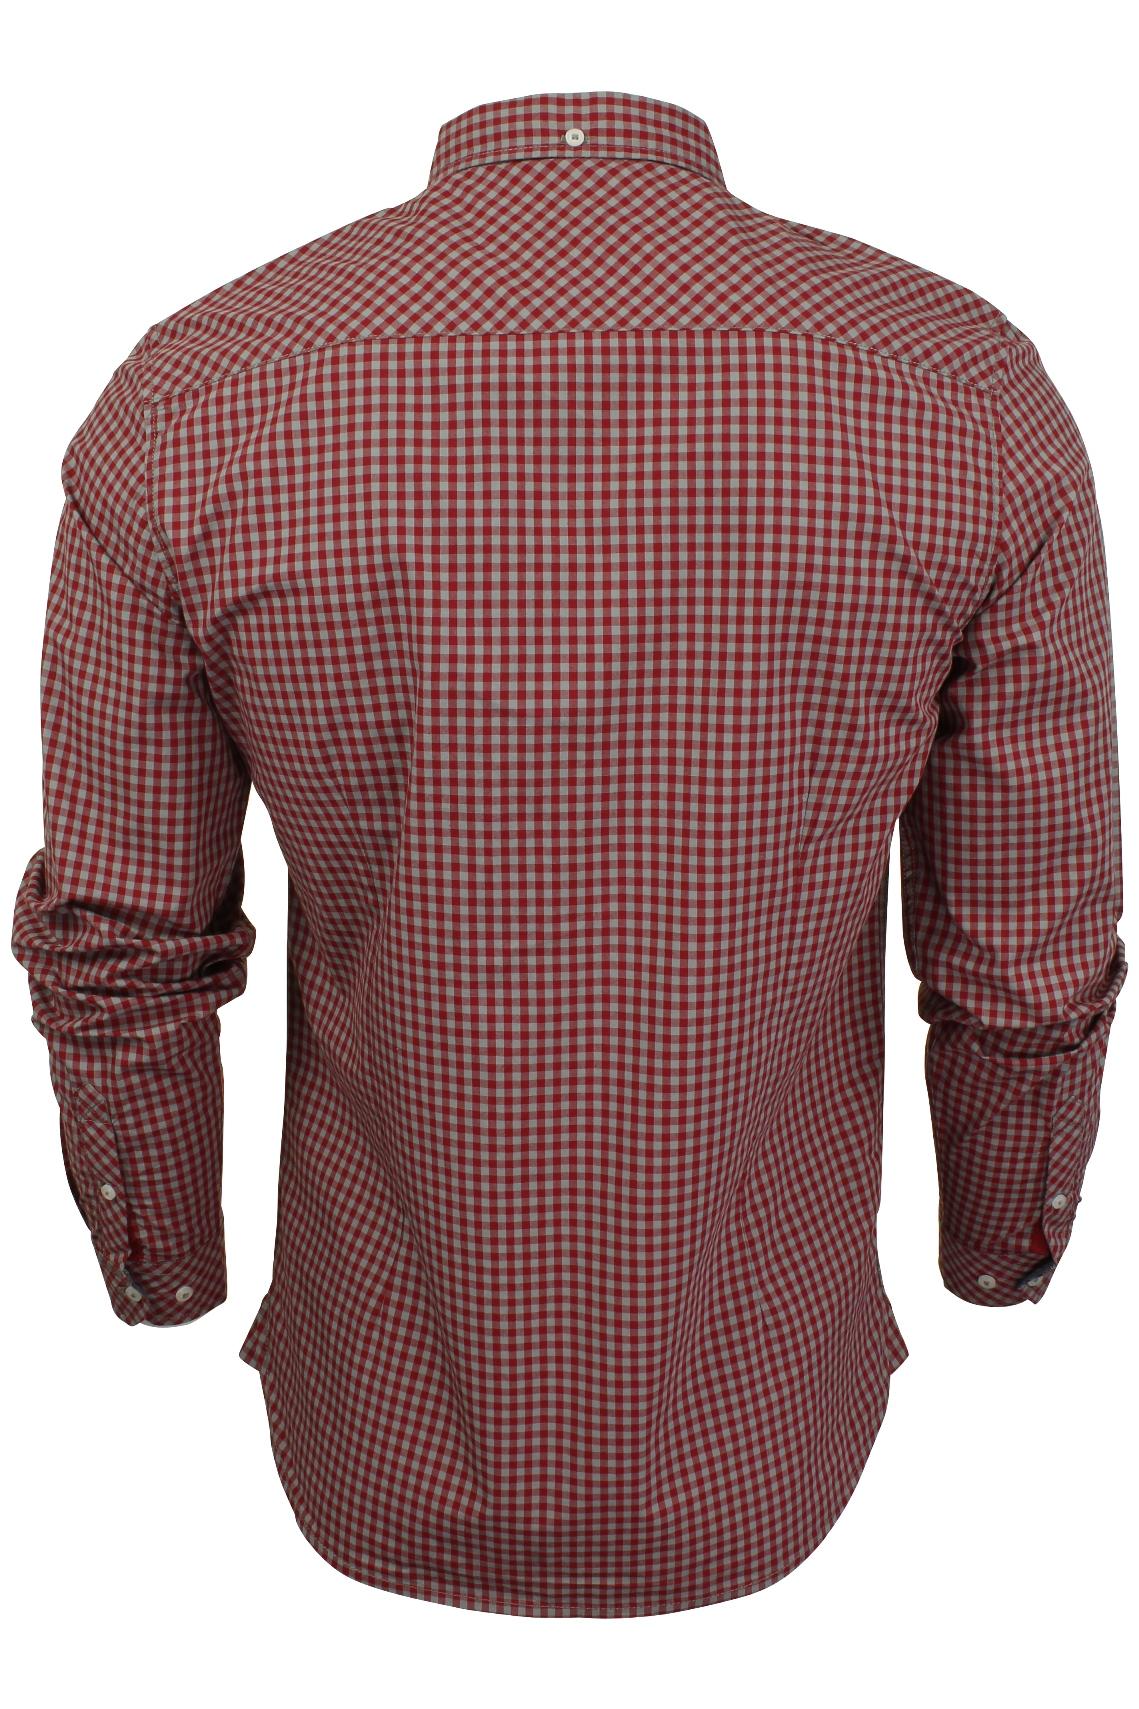 Mens-Gingham-Check-Shirt-by-Tokyo-Laundry-039-Newick-039-Long-Sleeved thumbnail 11